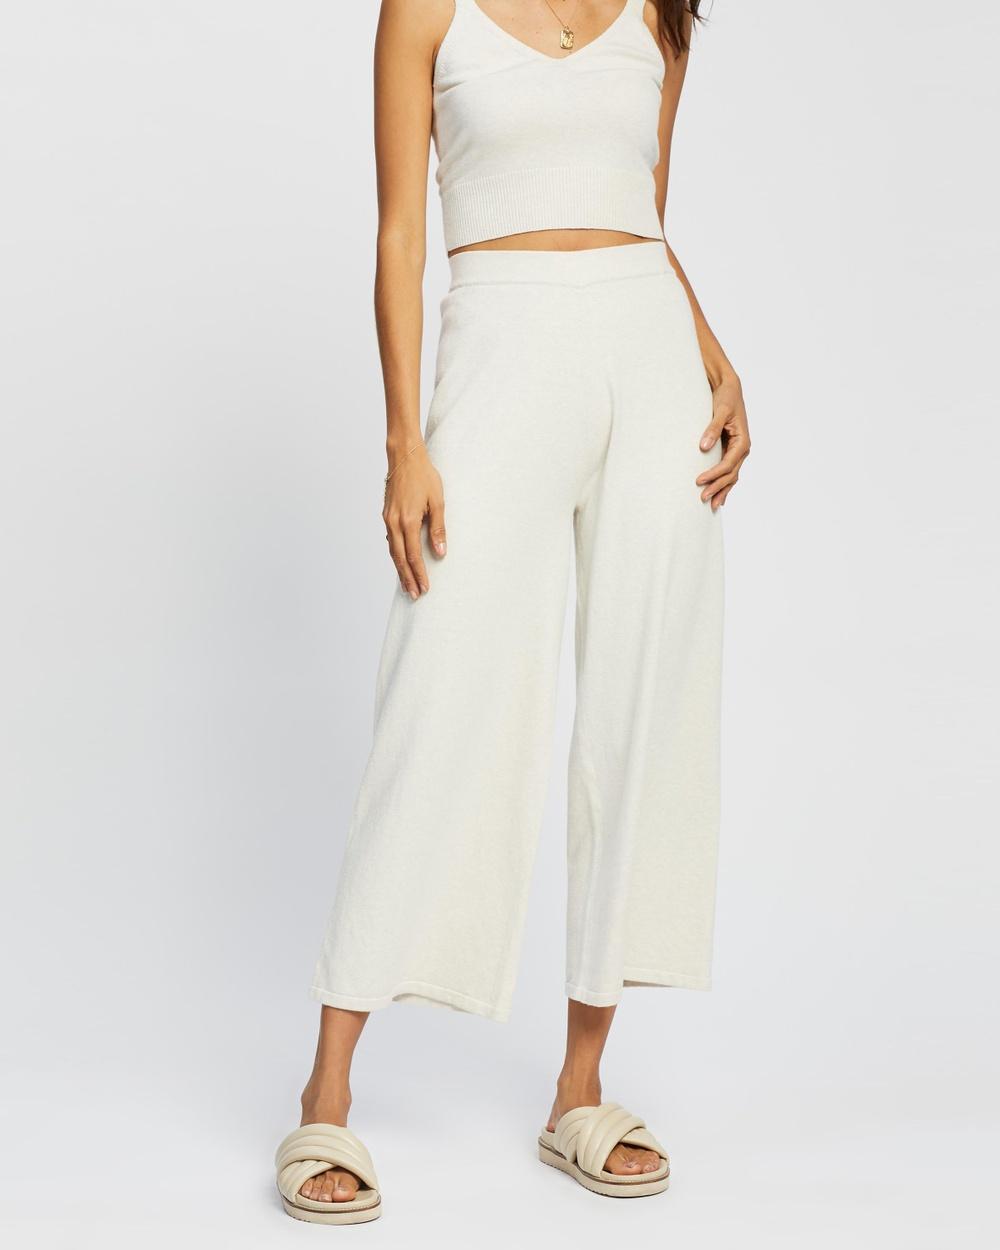 AERE Organic Cotton Knit Pants Cream